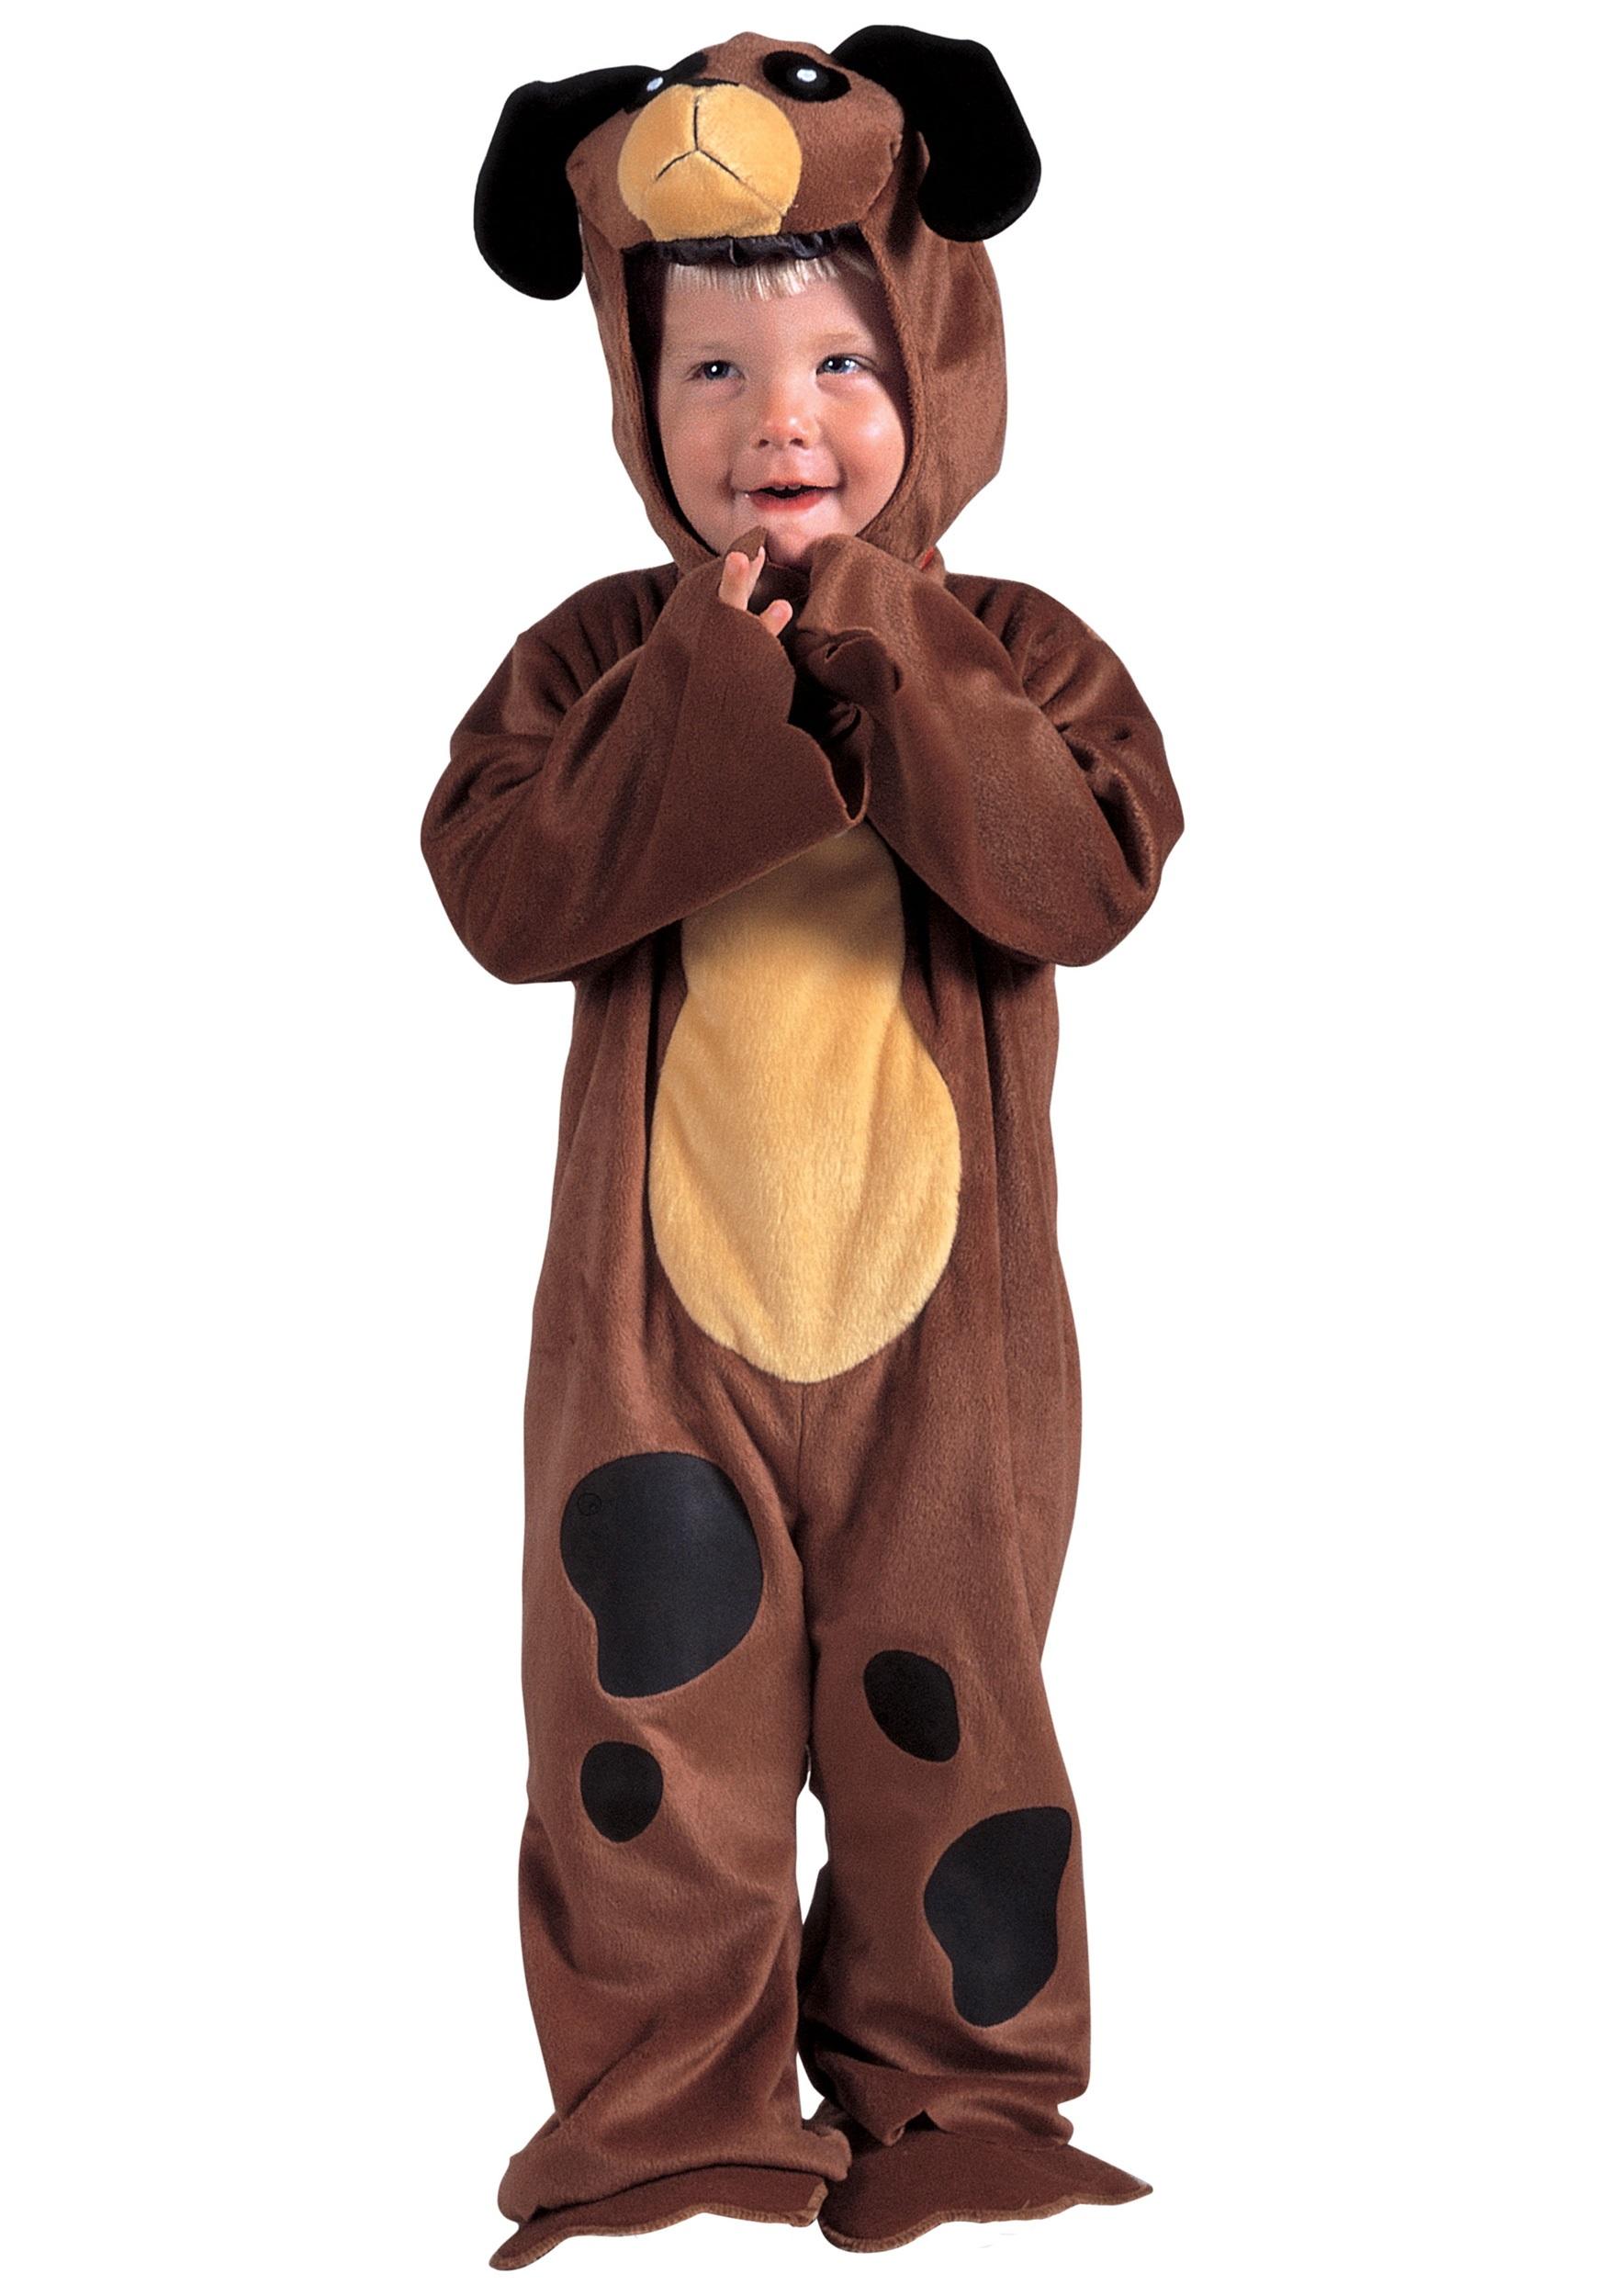 Puppy costumes costumes fc puppy costumes for toddlers solutioingenieria Image collections